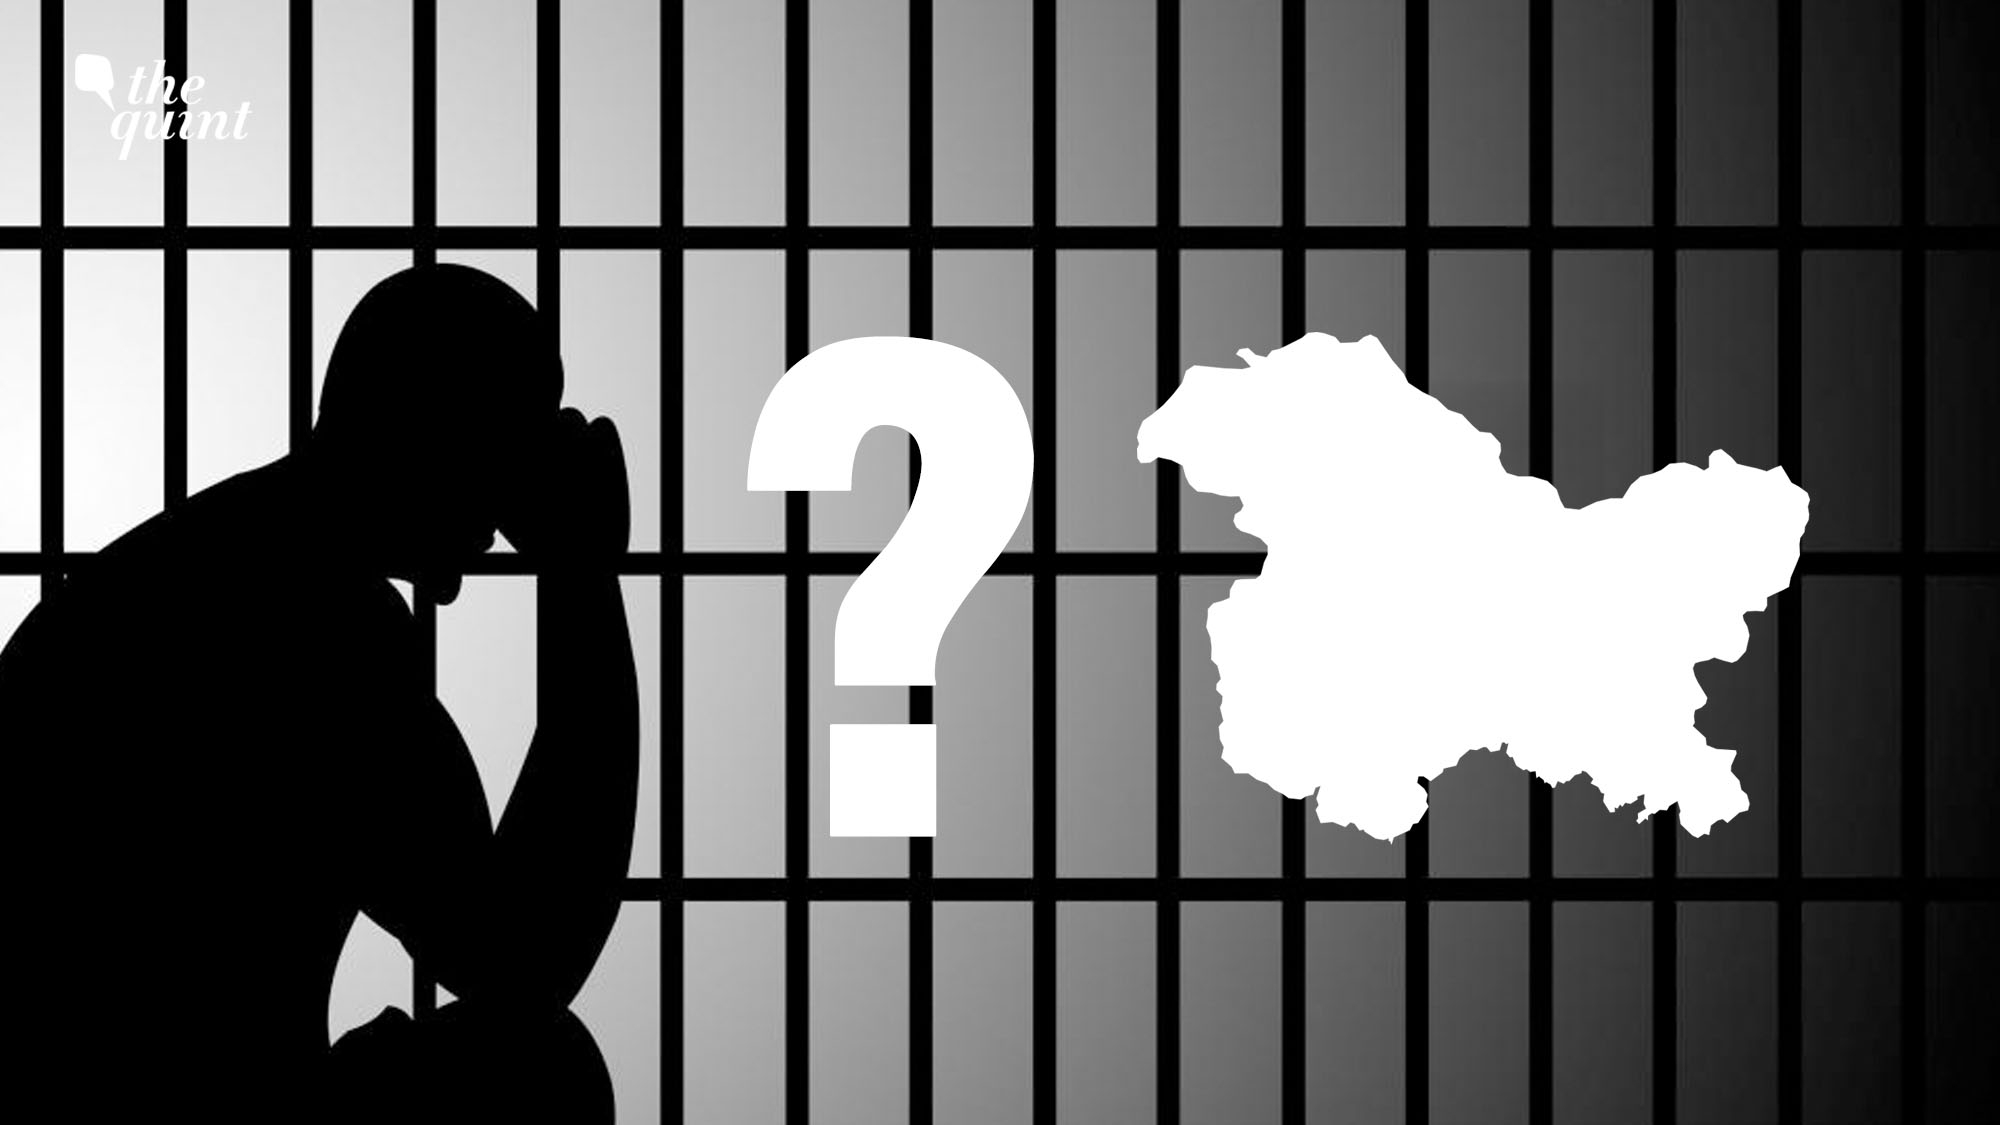 Govt Reply to Faesal Plea Raises Worries About Kashmir Detentions